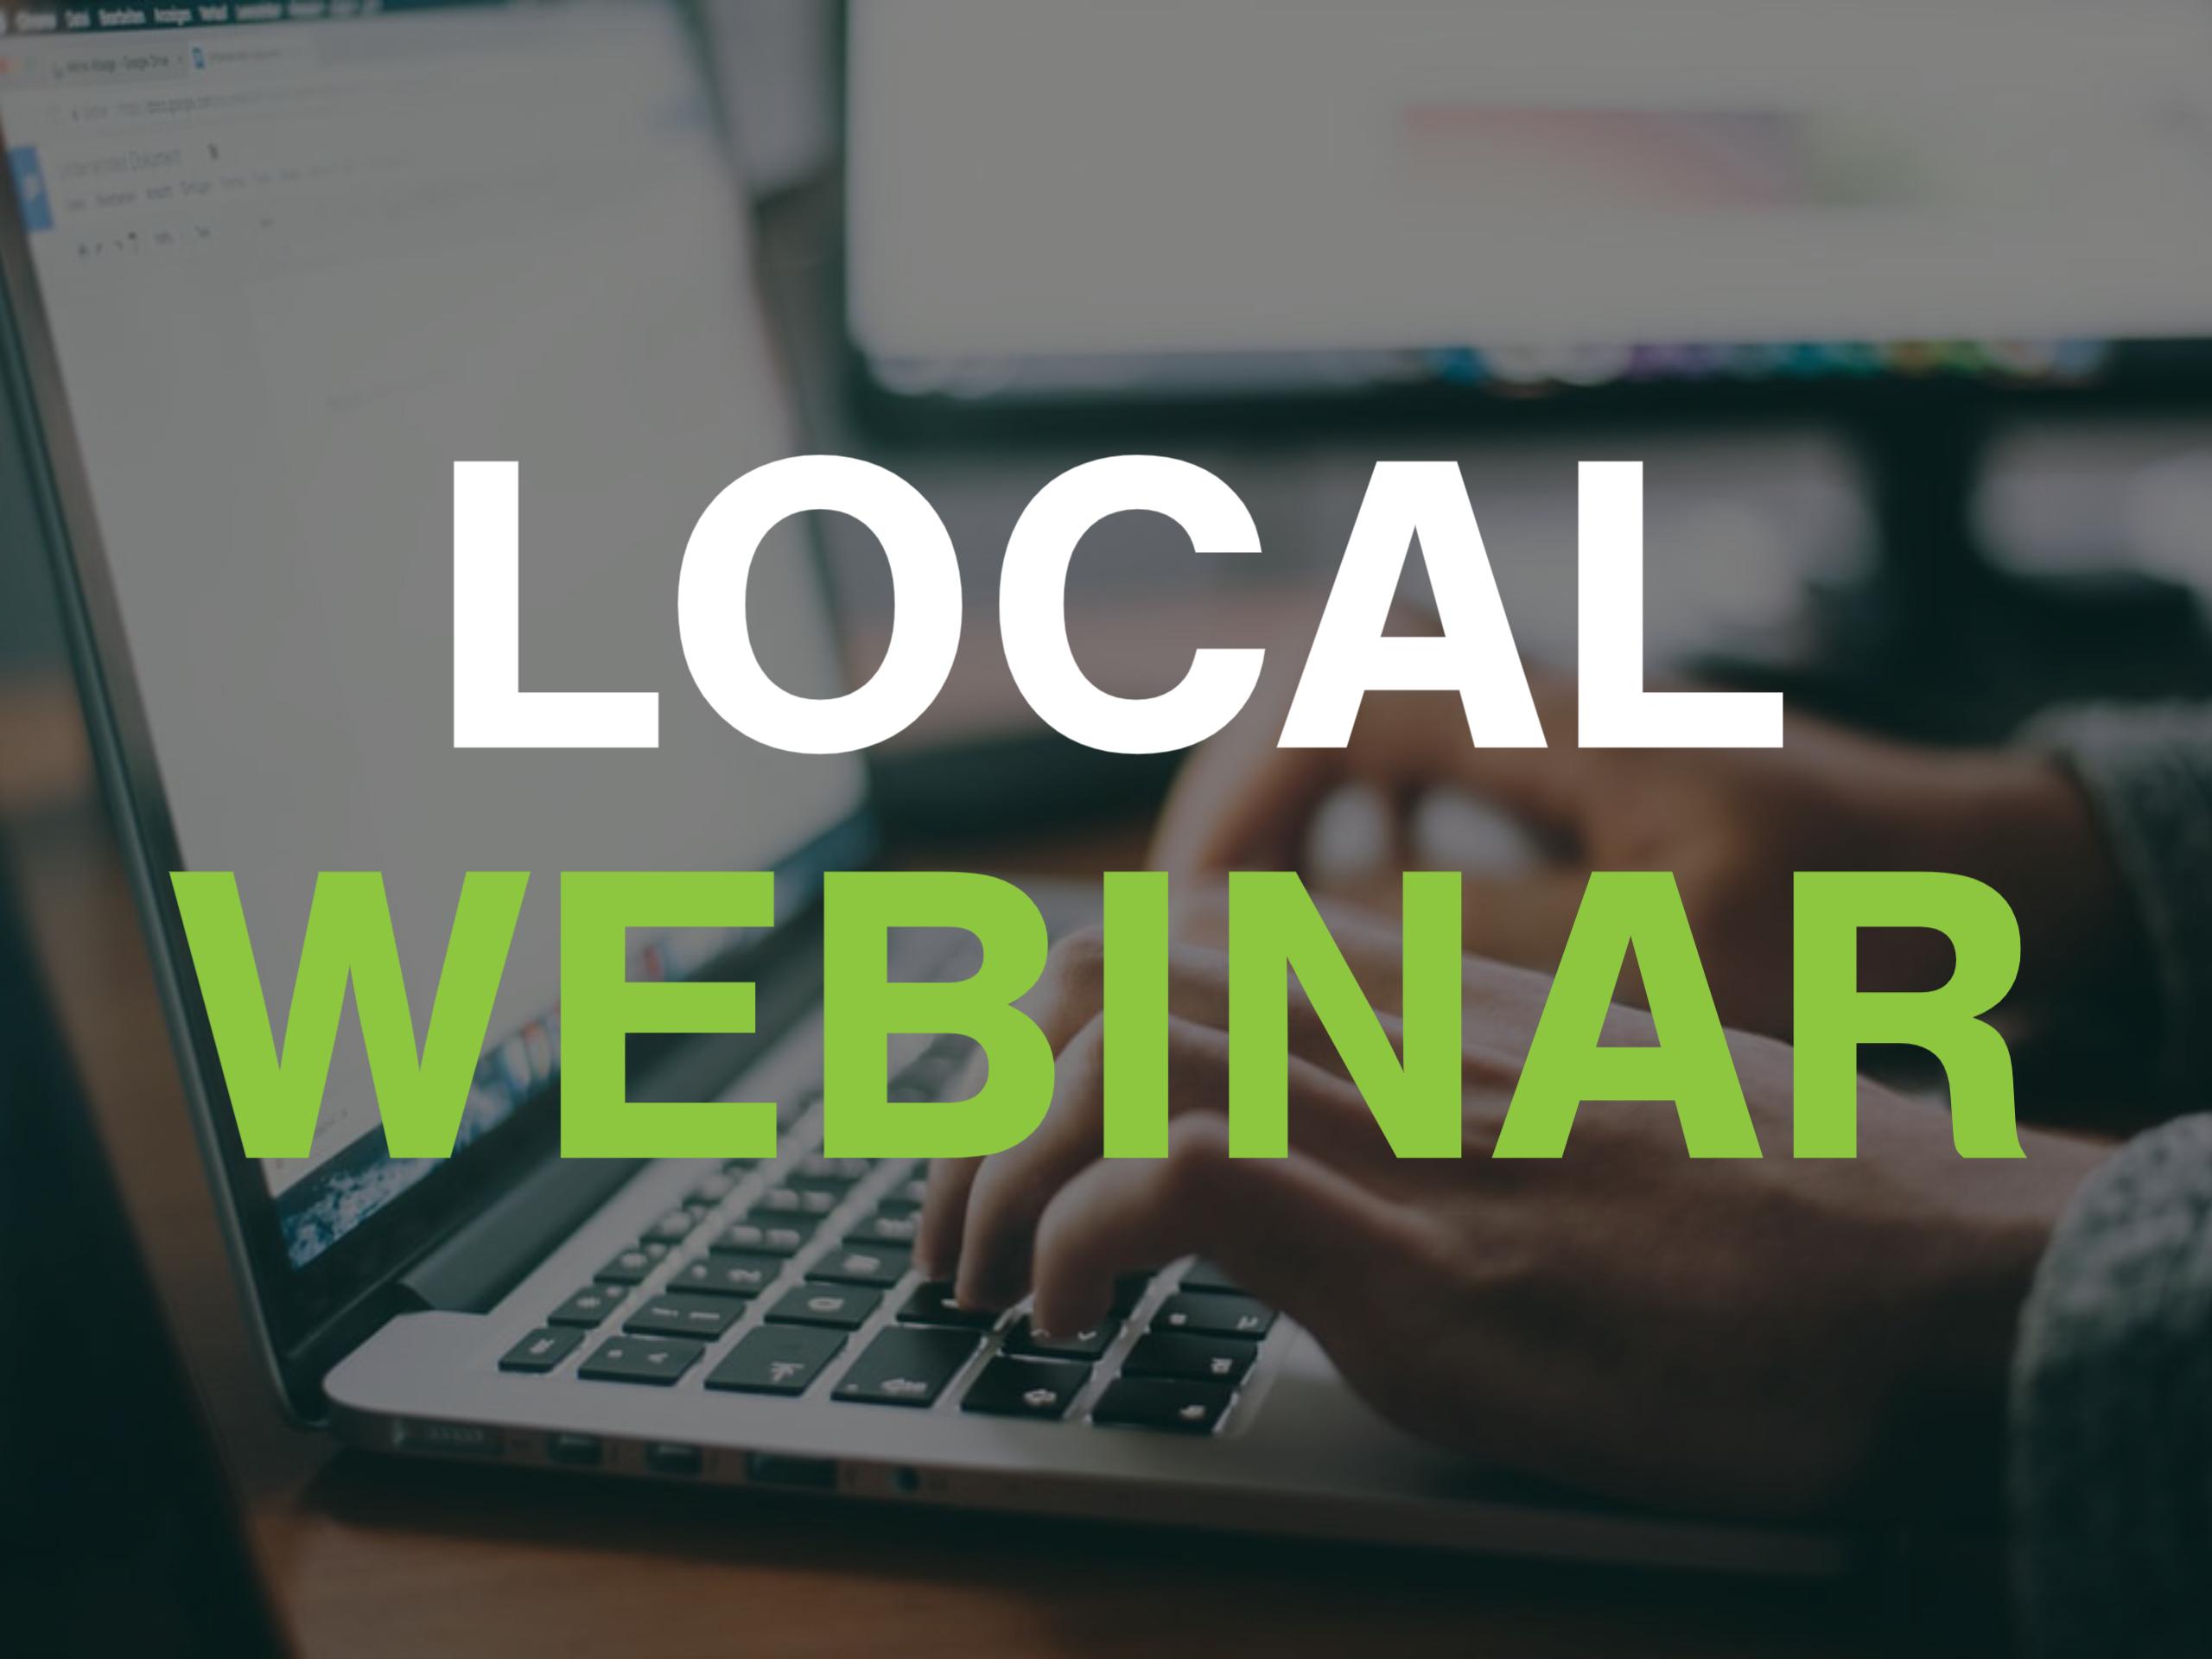 Icon - Local Webinar